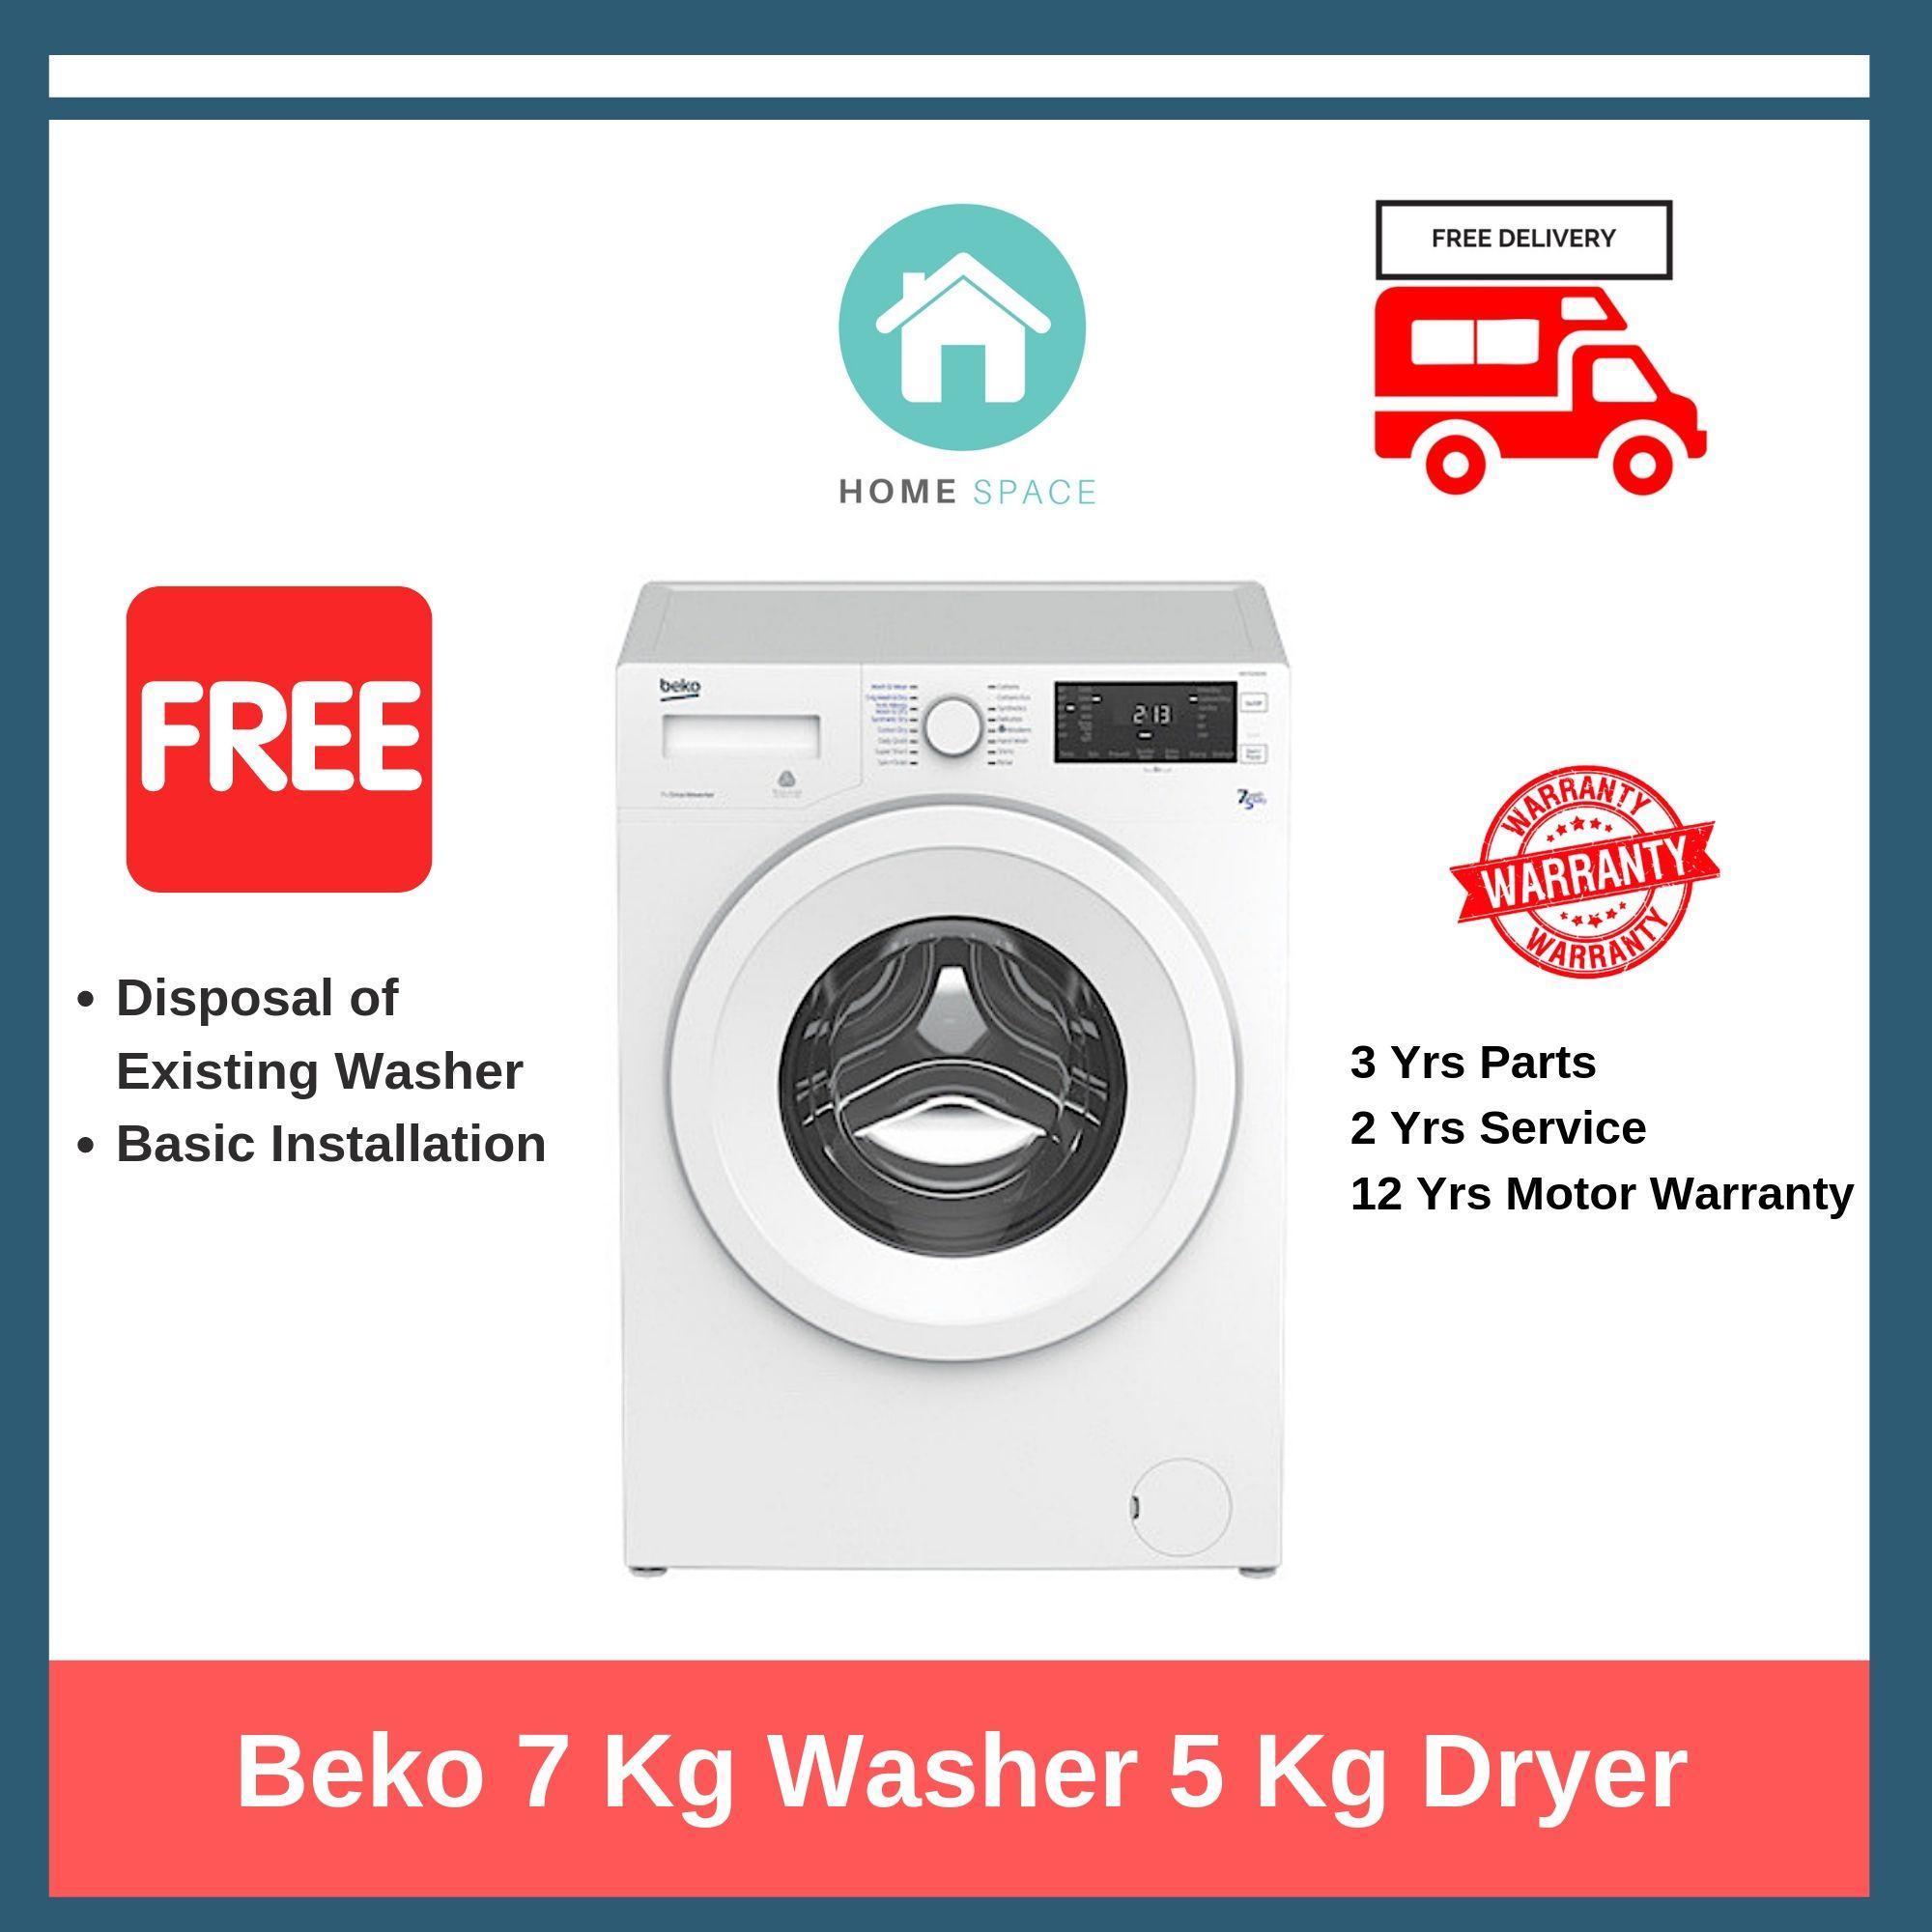 Beko 7kg Washer 5kg Dryer With Aquawave™ Technology + Free Delivery, Basic Installation.